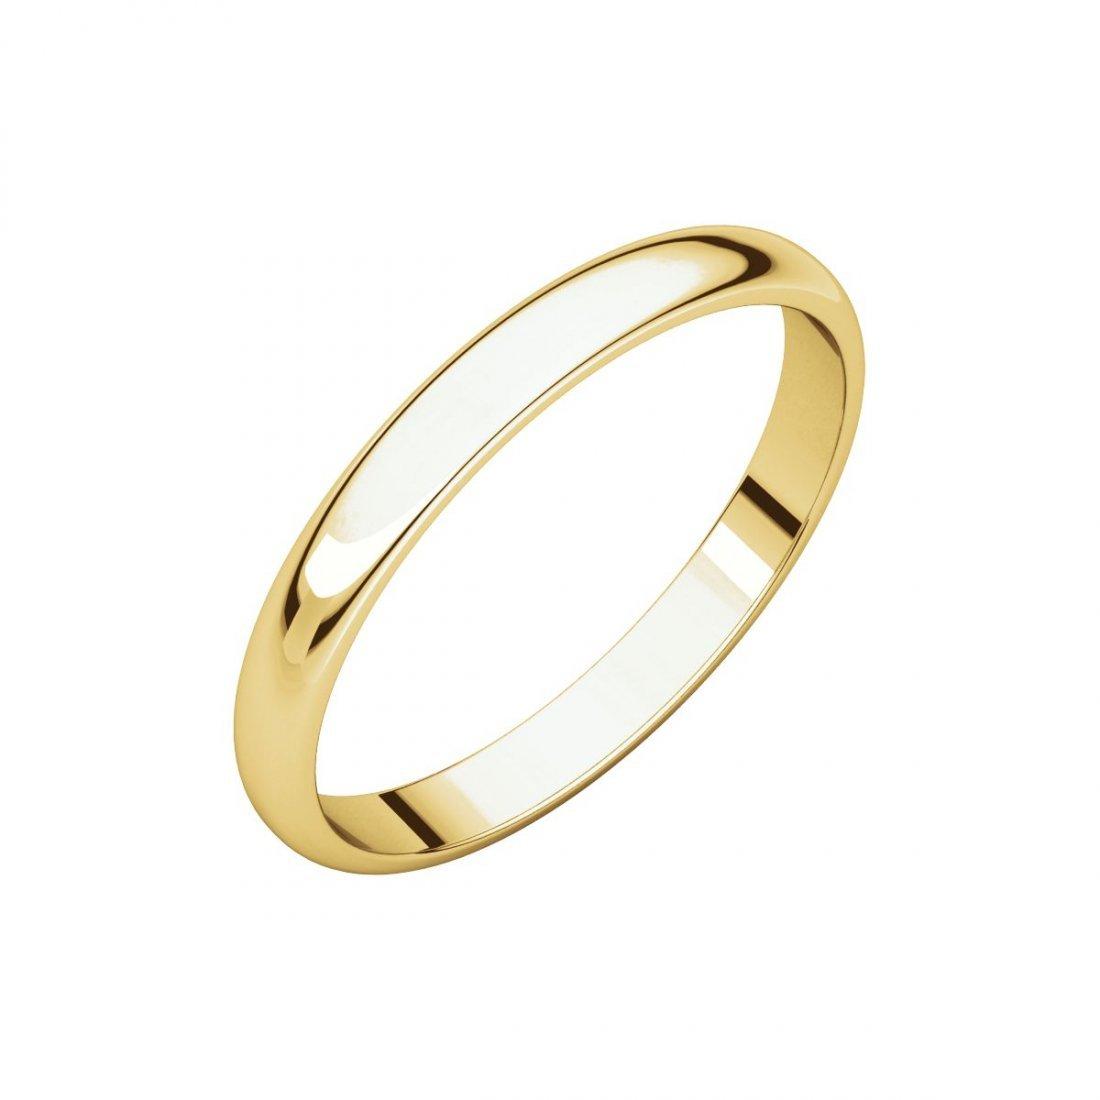 Ring - 10k Yellow Gold 2.5mm Half Round Light Band